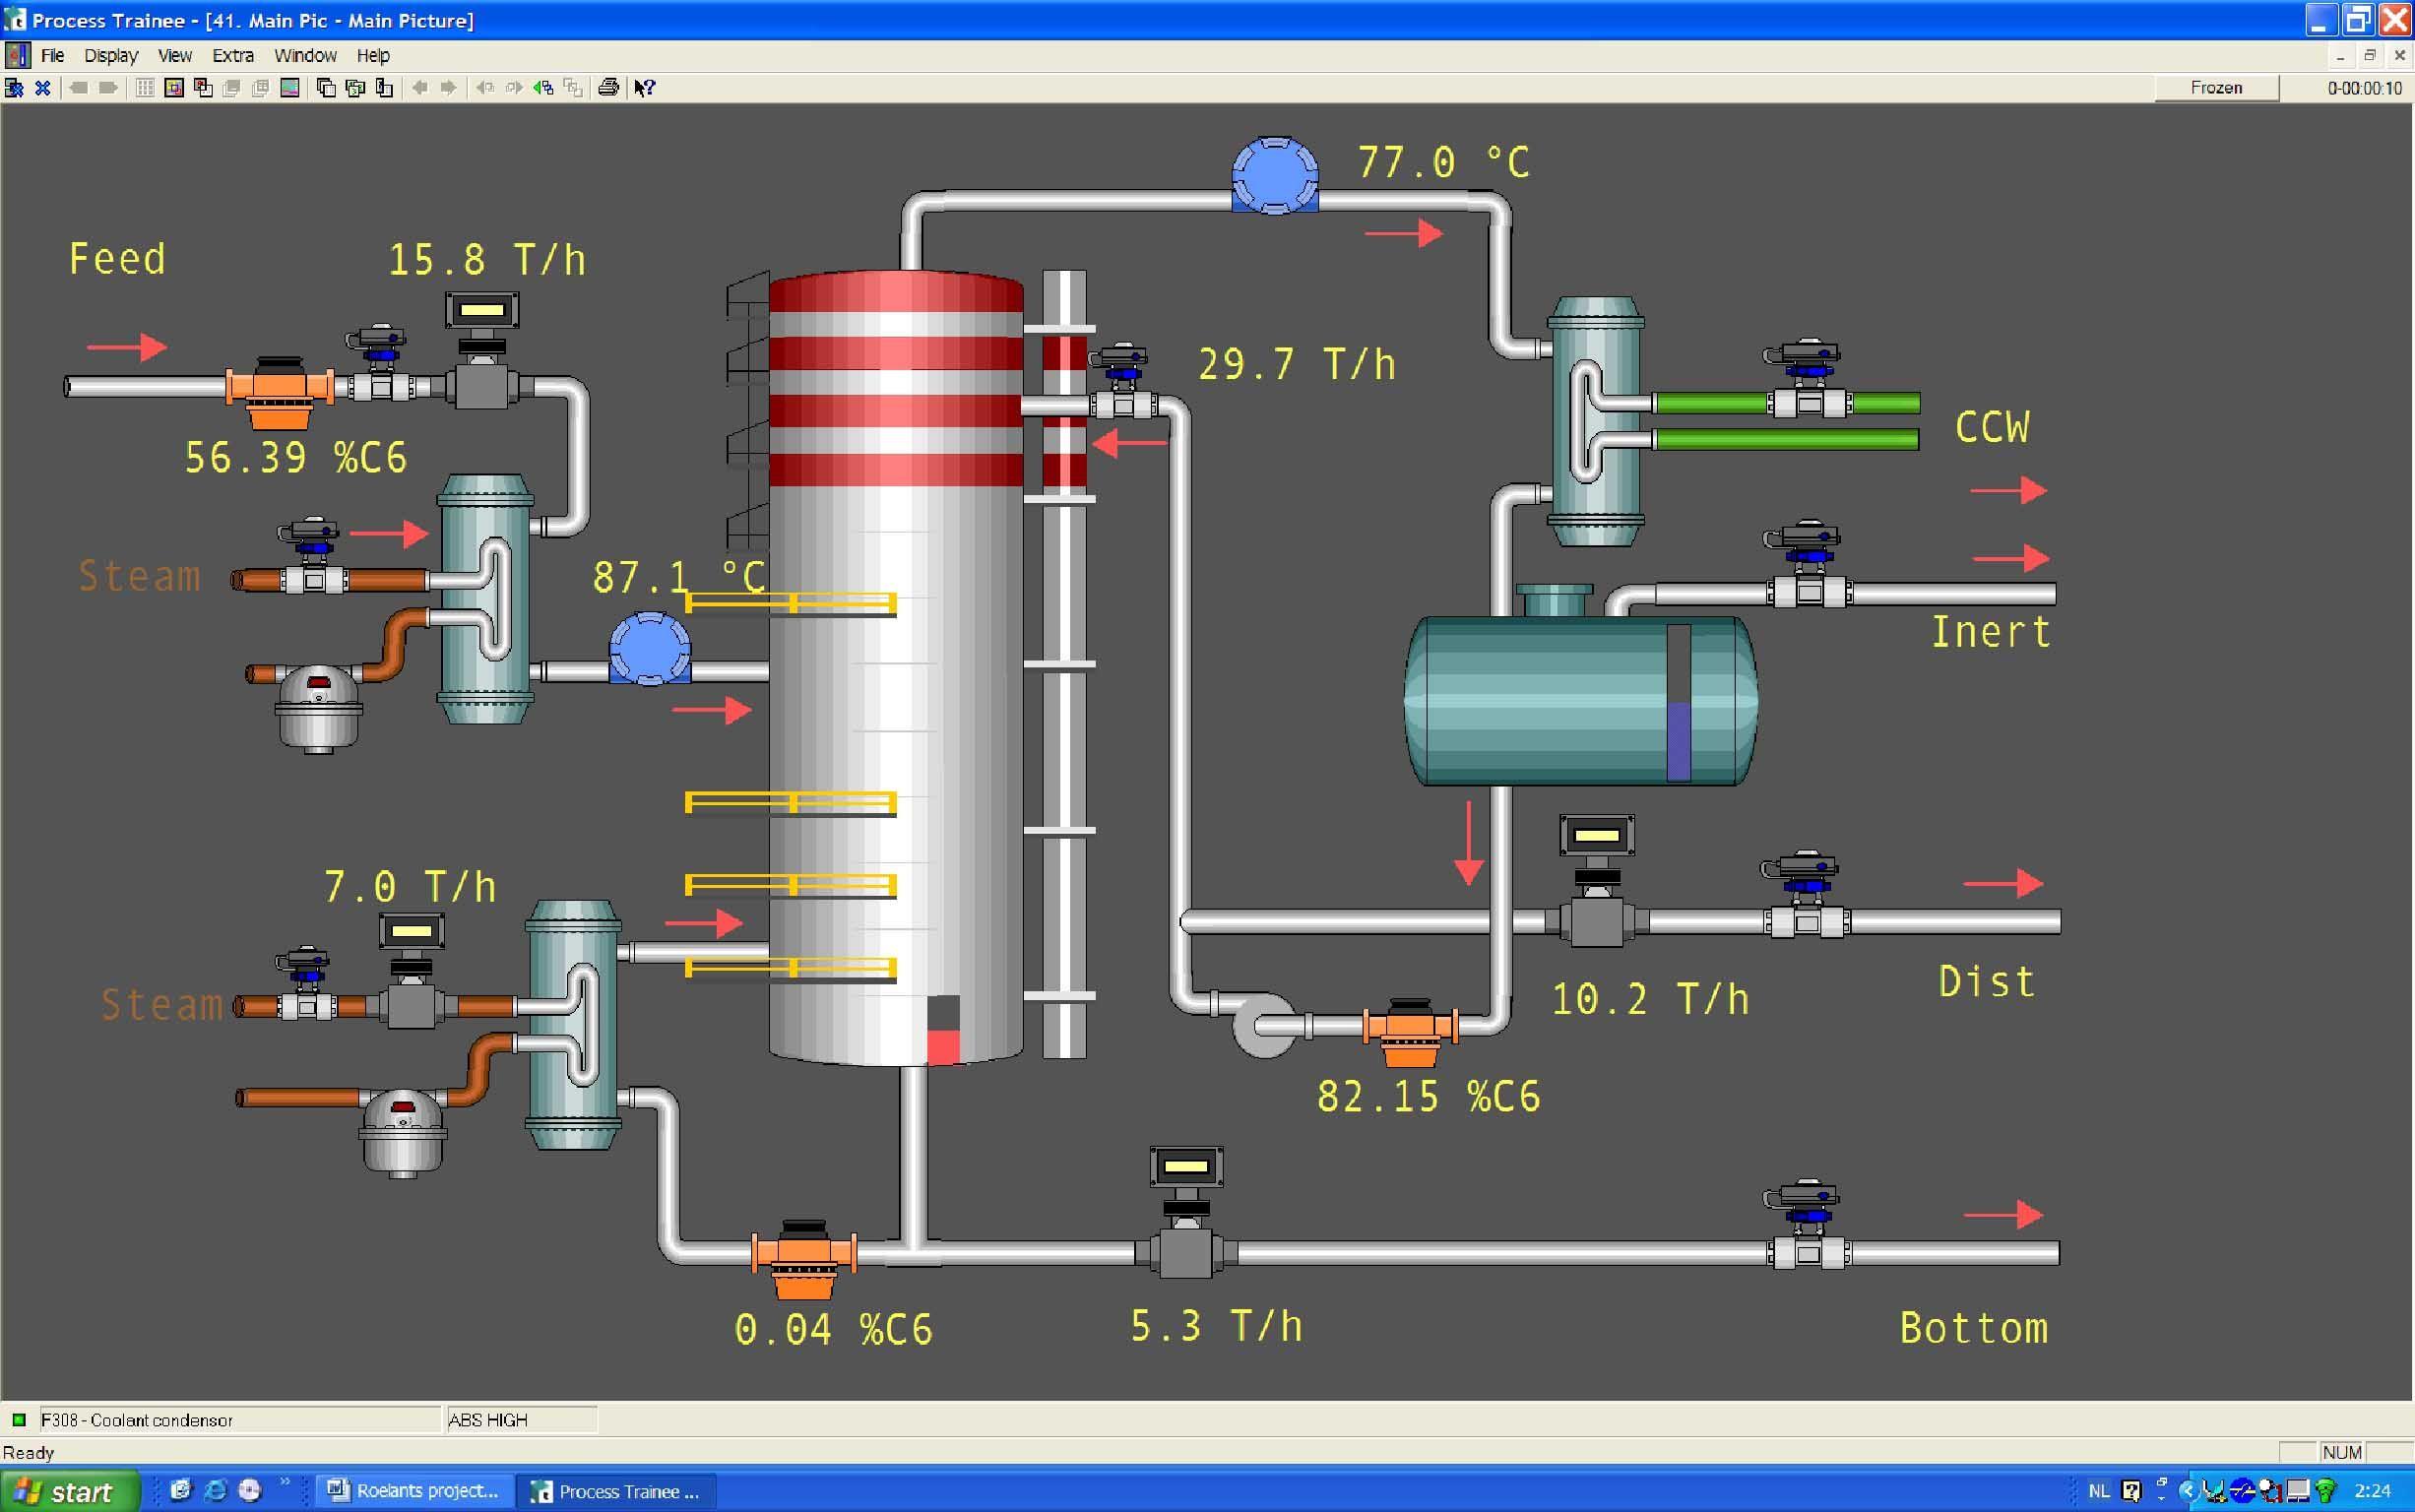 proces simulaties